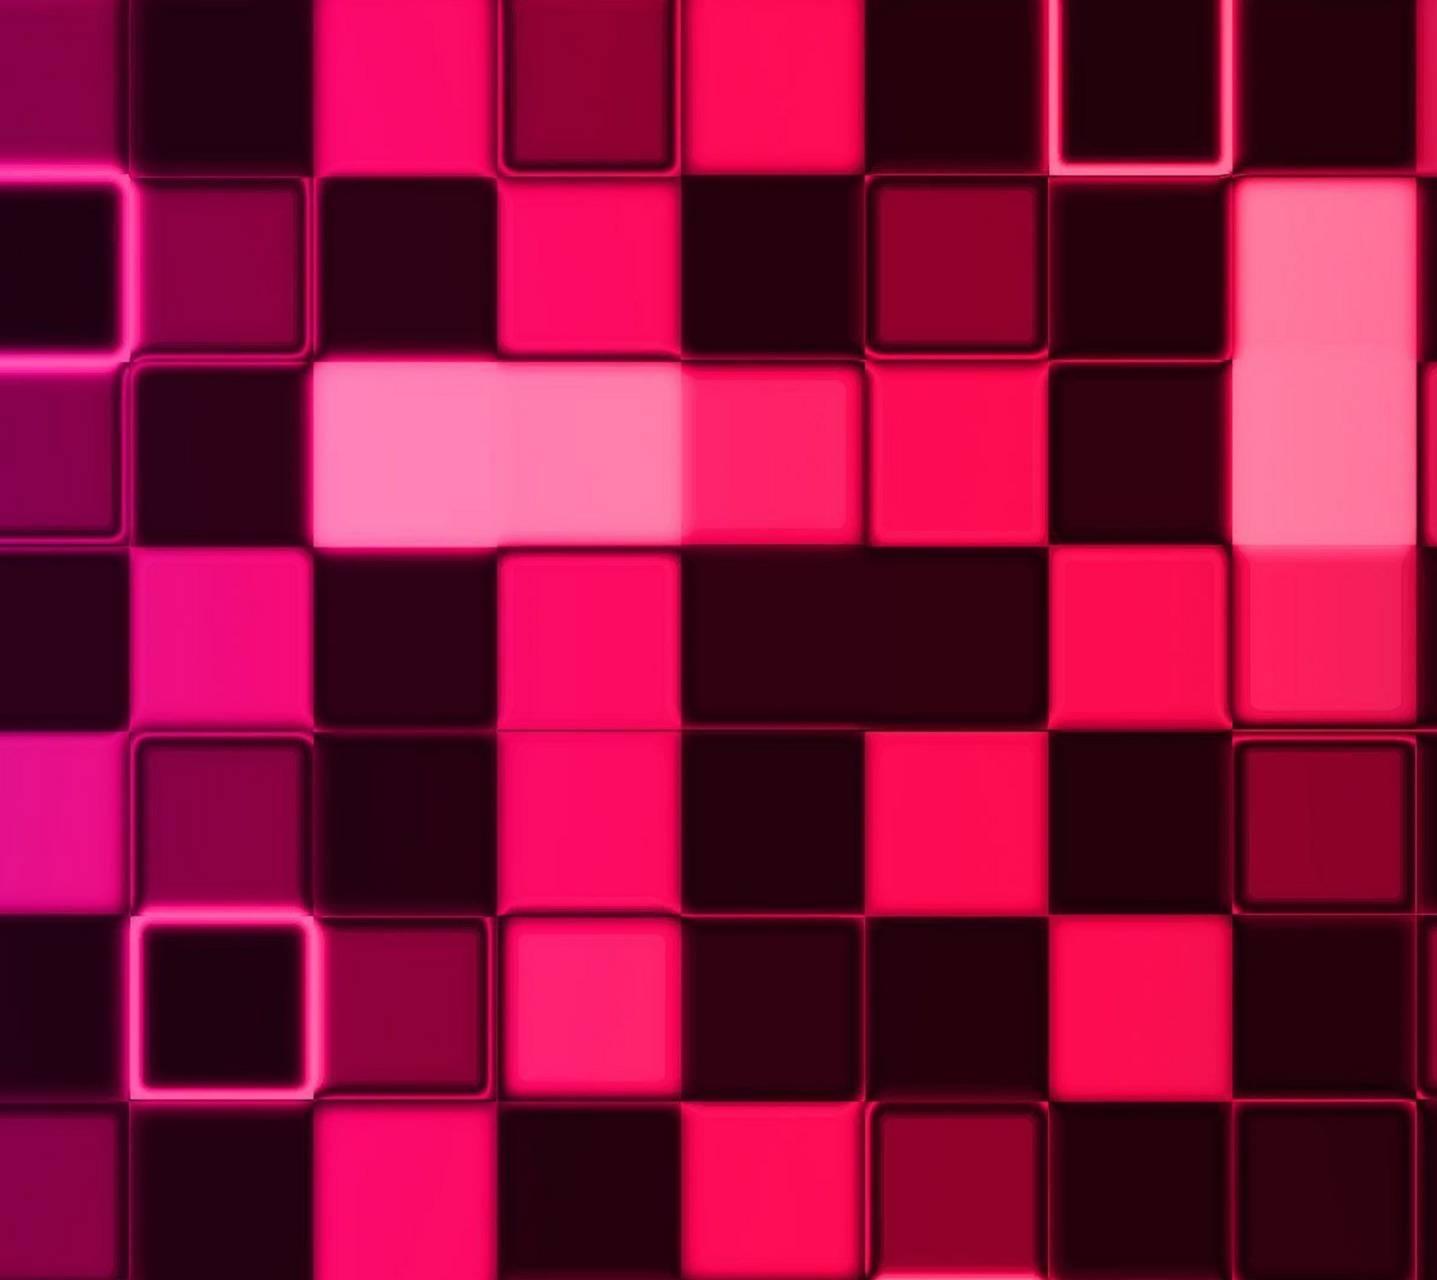 Pink Cube Wall